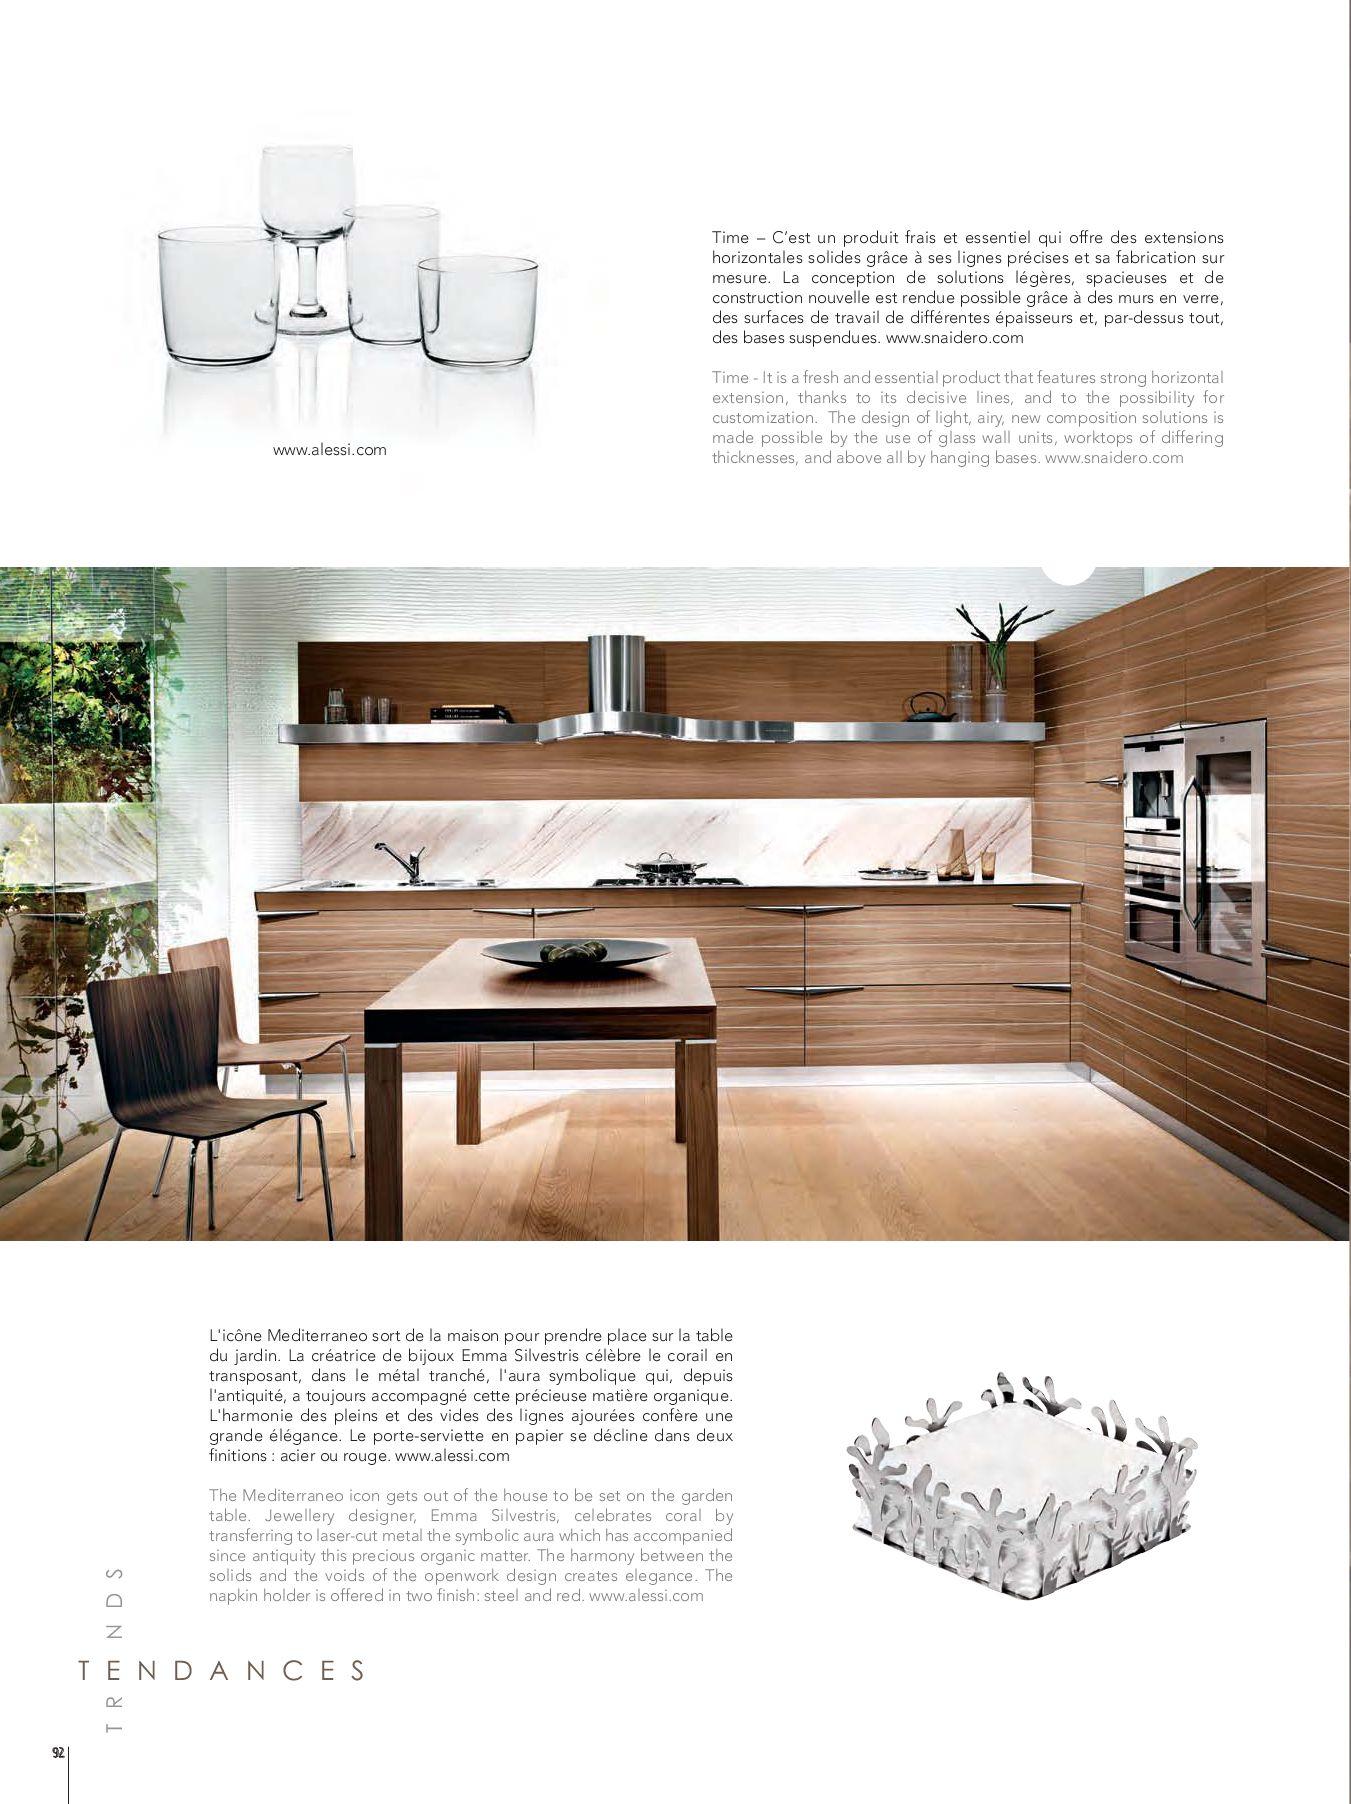 C Maison Et Jardin Magazine prestige design magazine - vol 7 num 1prestige design